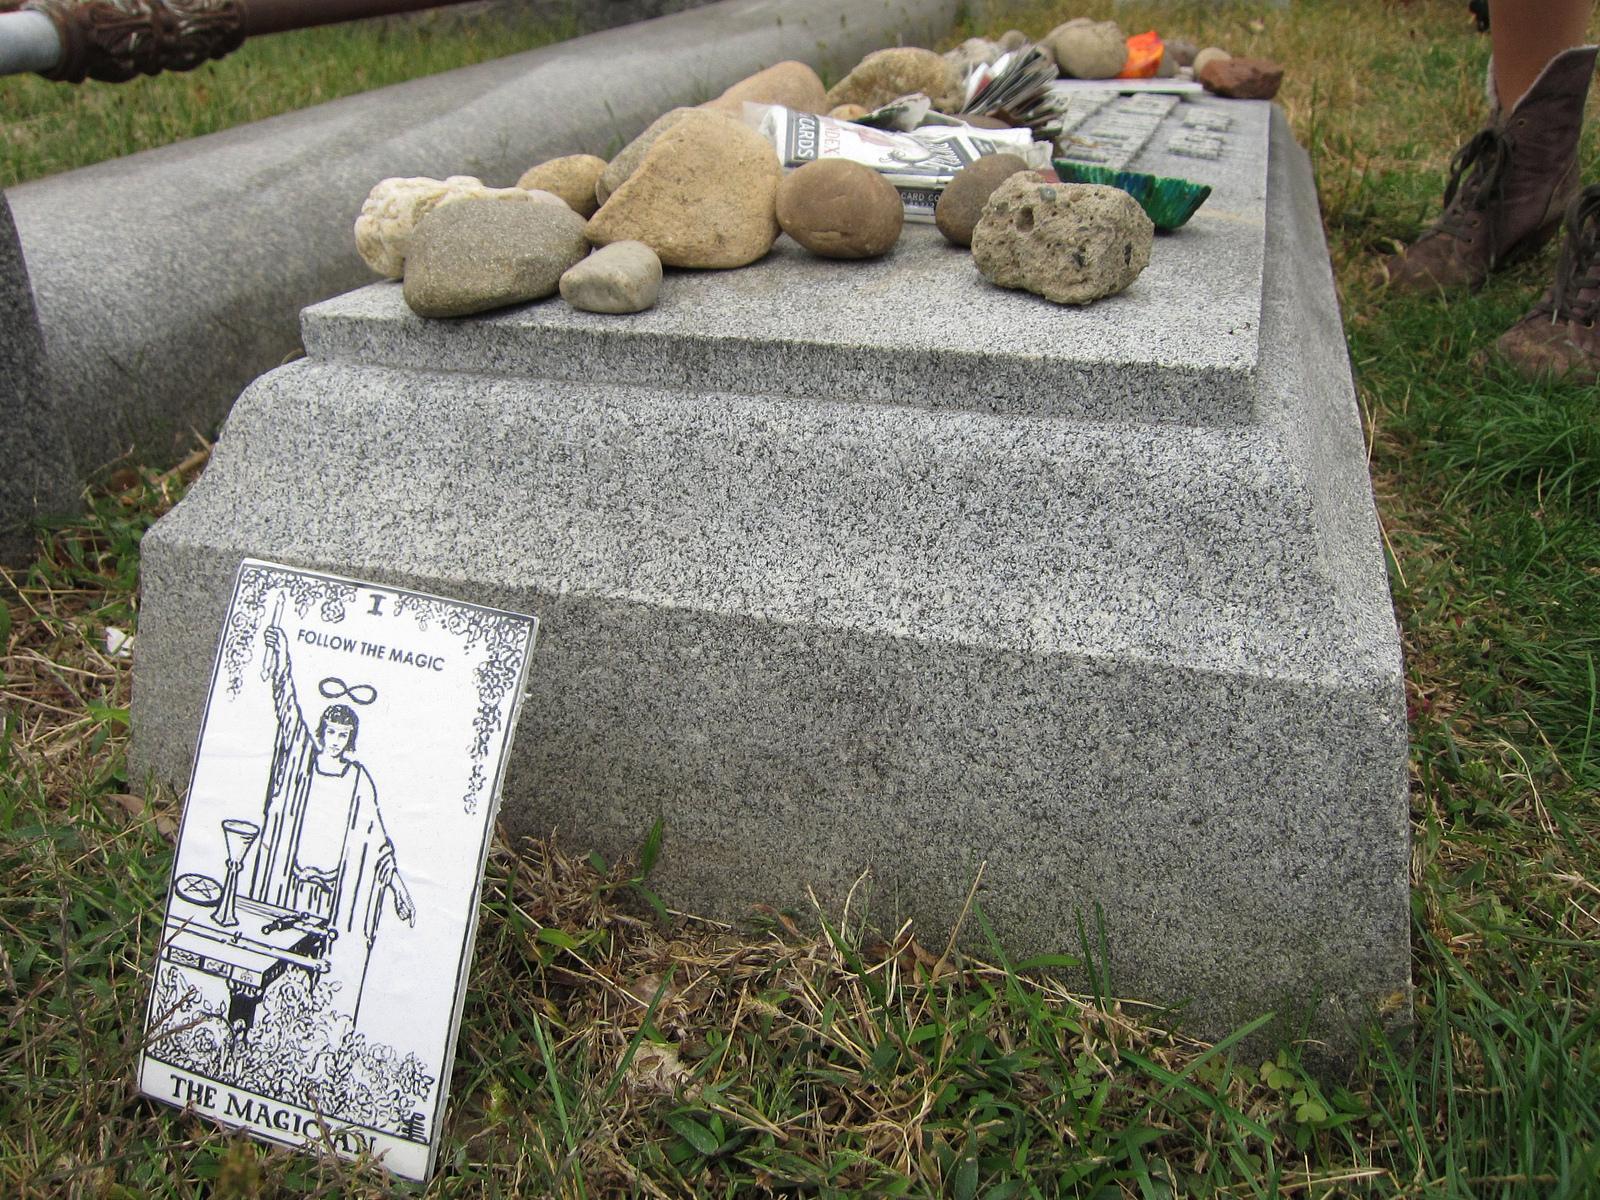 Magician Tarot card at Houdini's grave